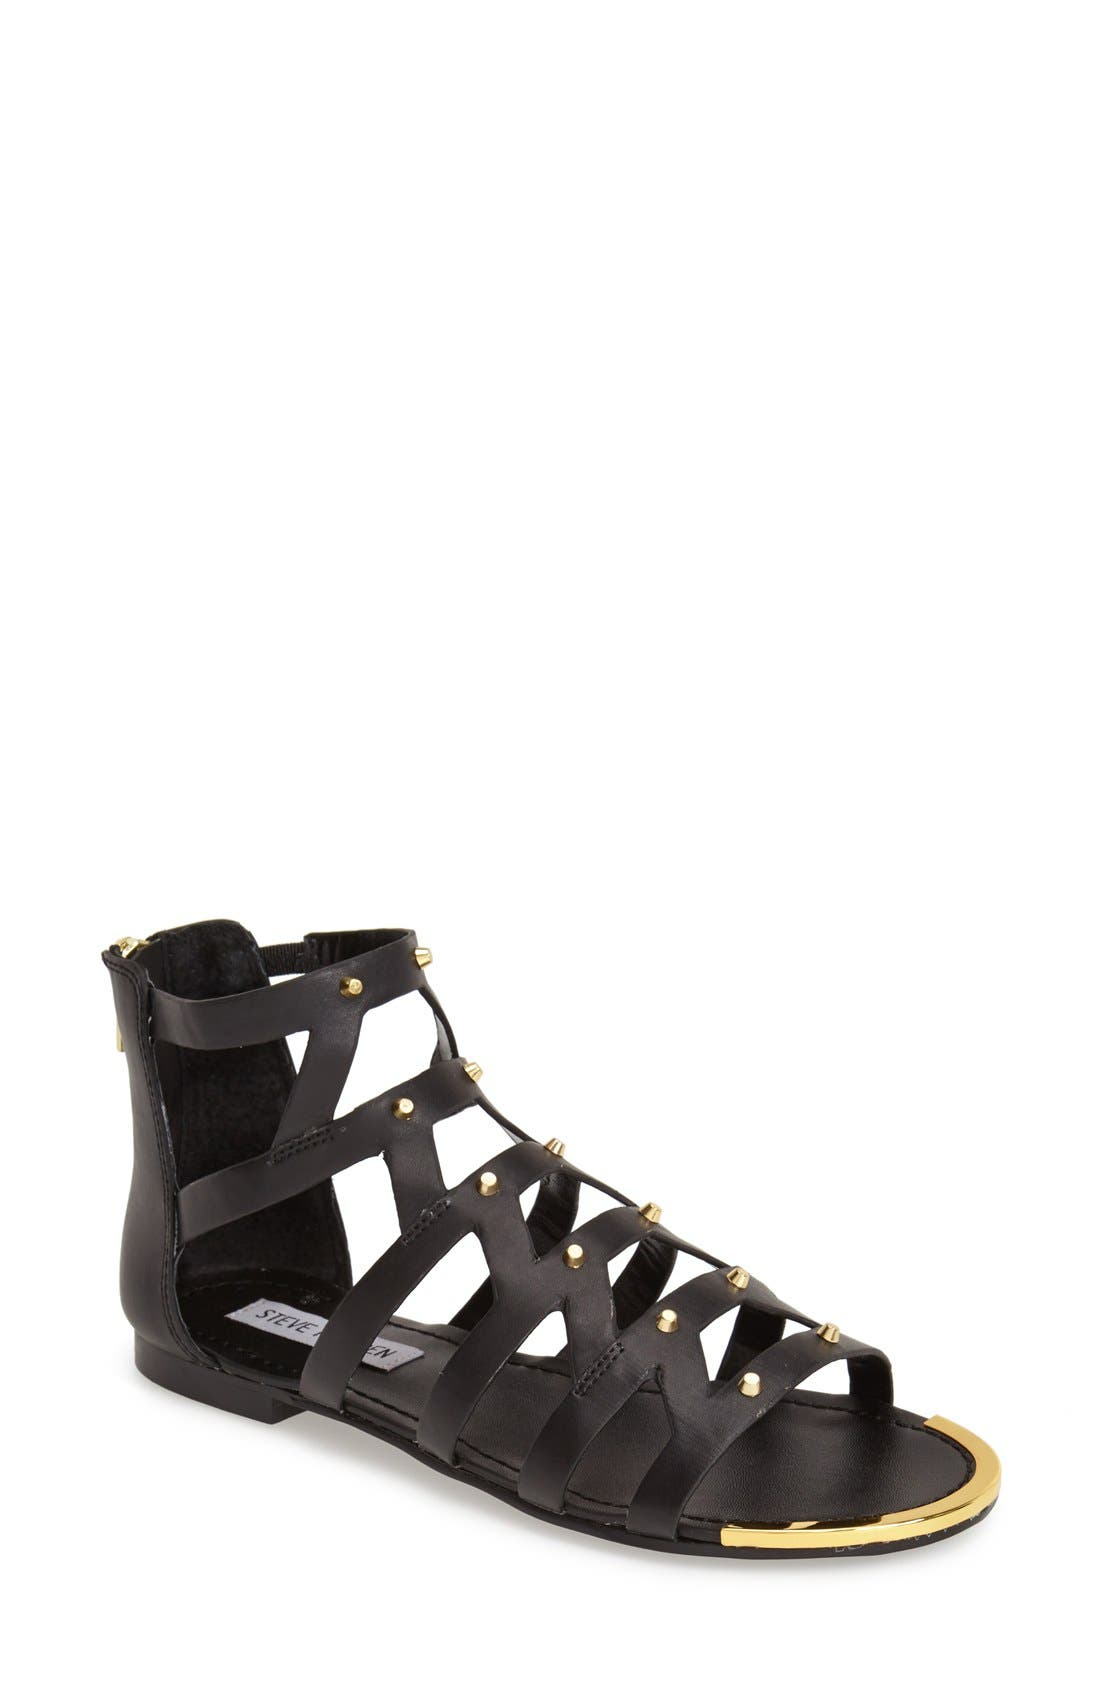 'Claudiaa' Studded Gladiator Sandal,                             Main thumbnail 1, color,                             005